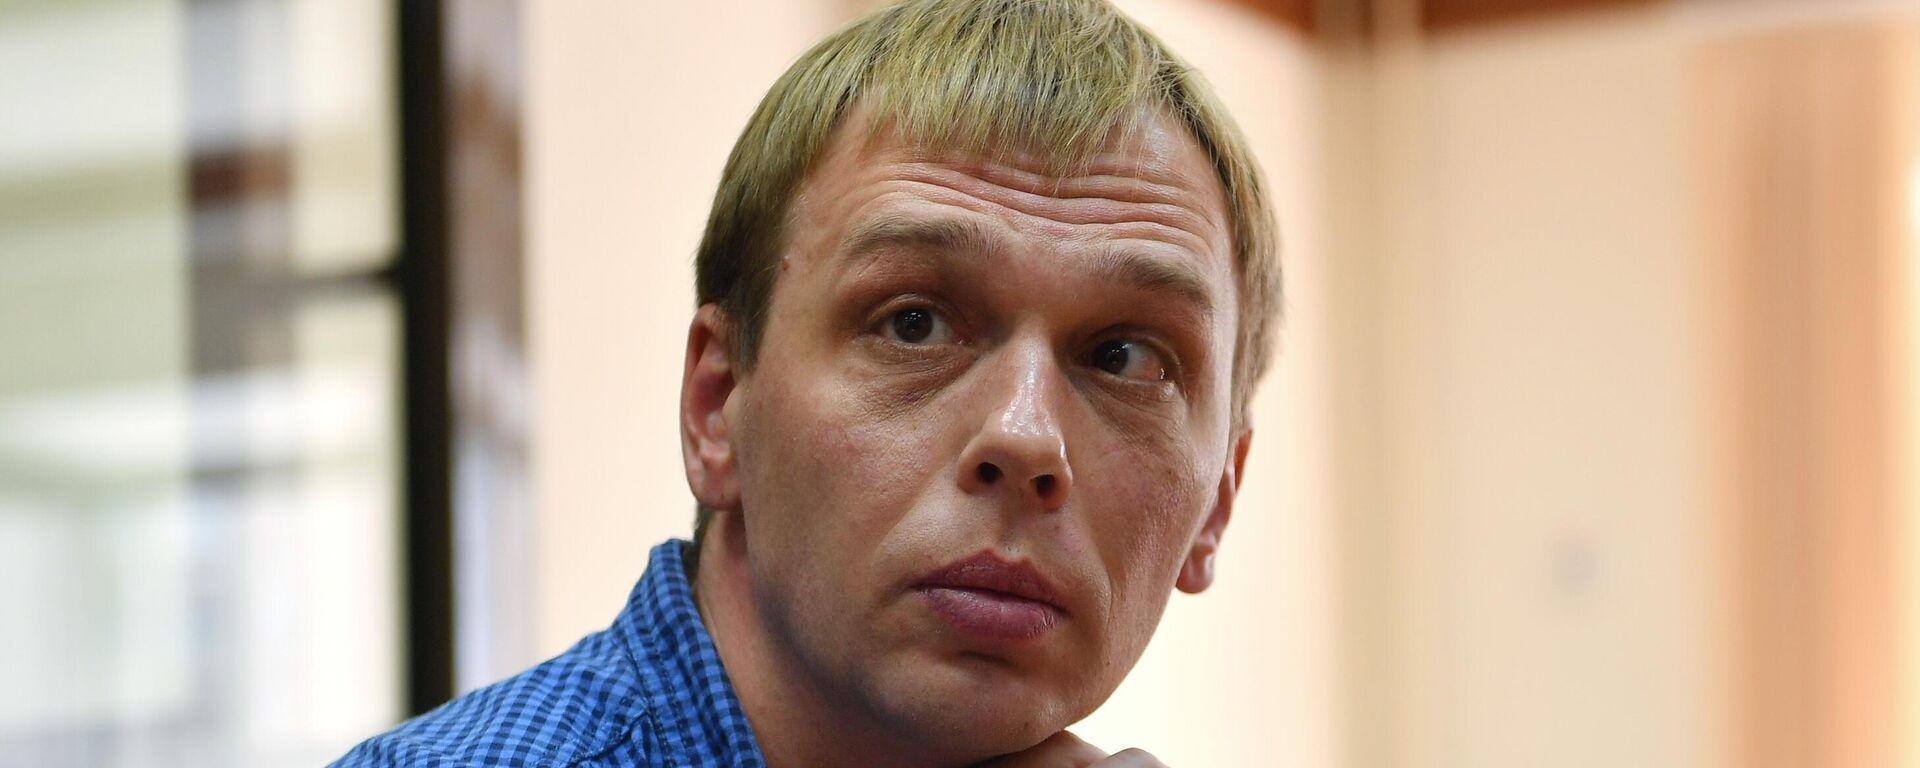 El periodista ruso Iván Golunov - Sputnik Mundo, 1920, 28.05.2021